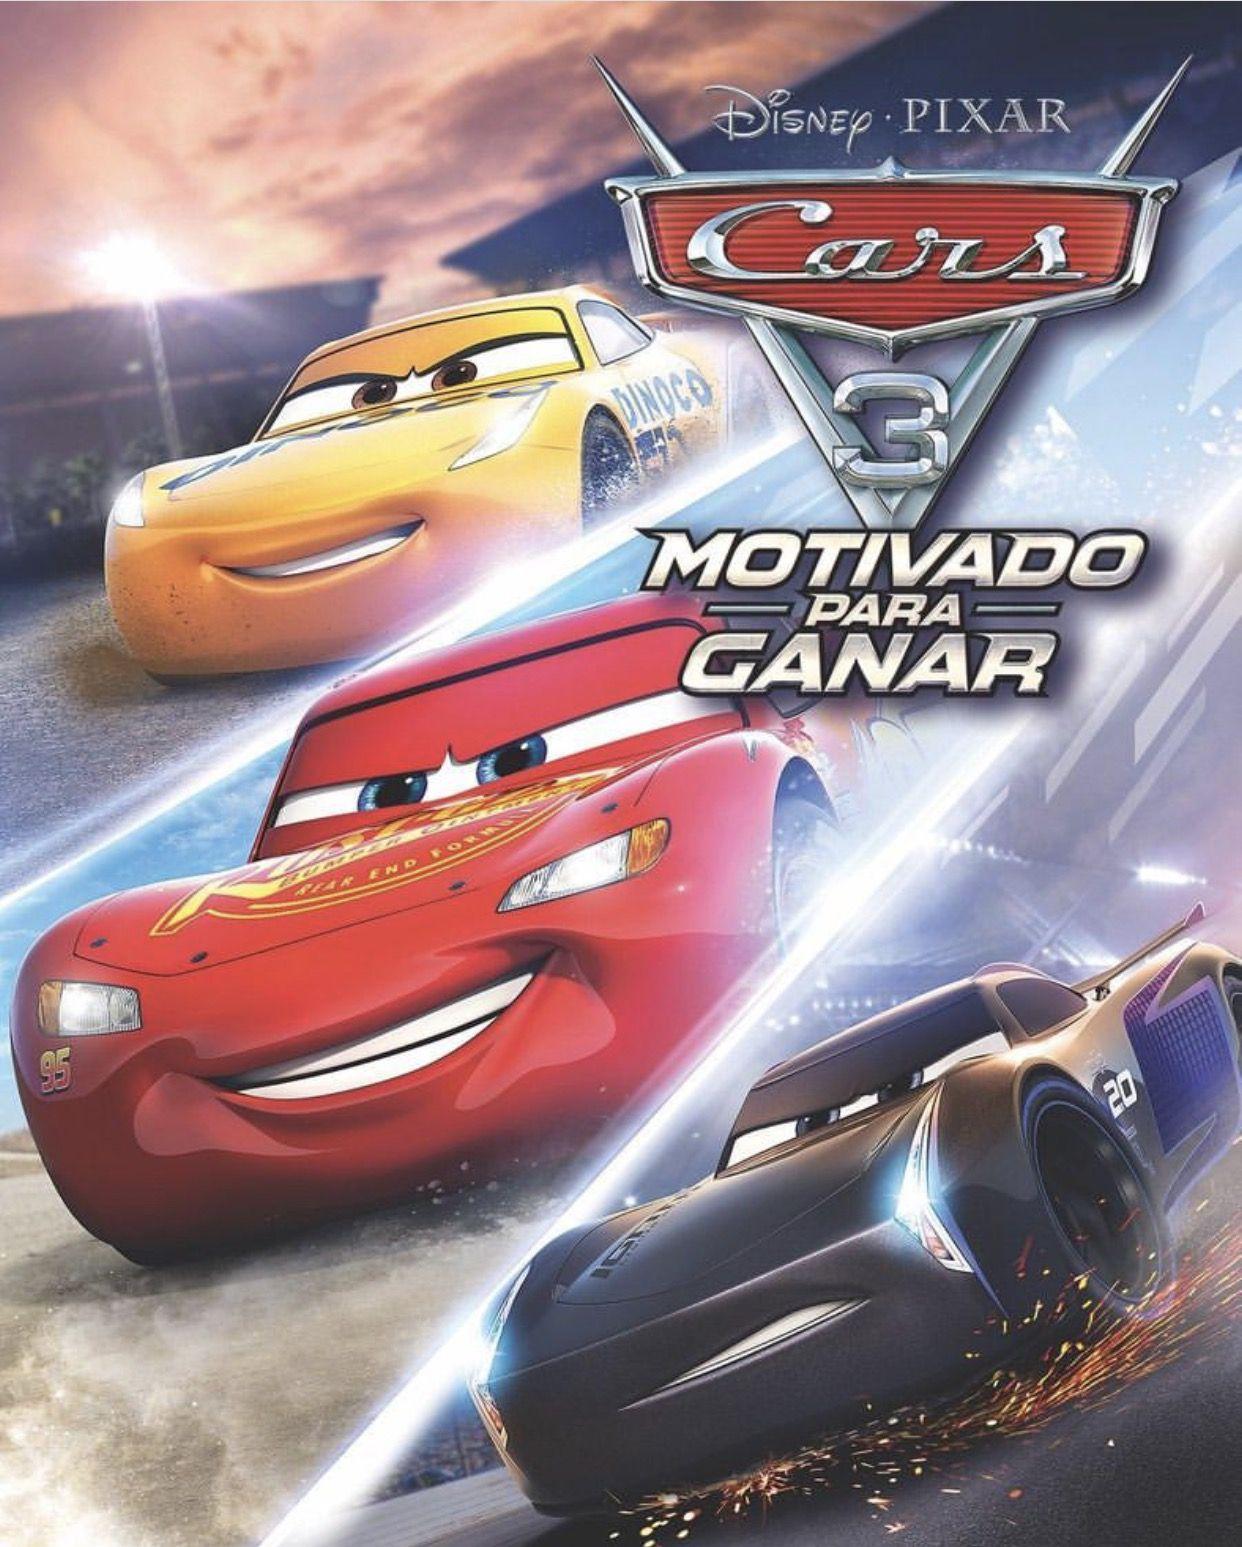 Pin By Rosali Melgar On Disney Car Games Disney Cars Disney Pixar Cars